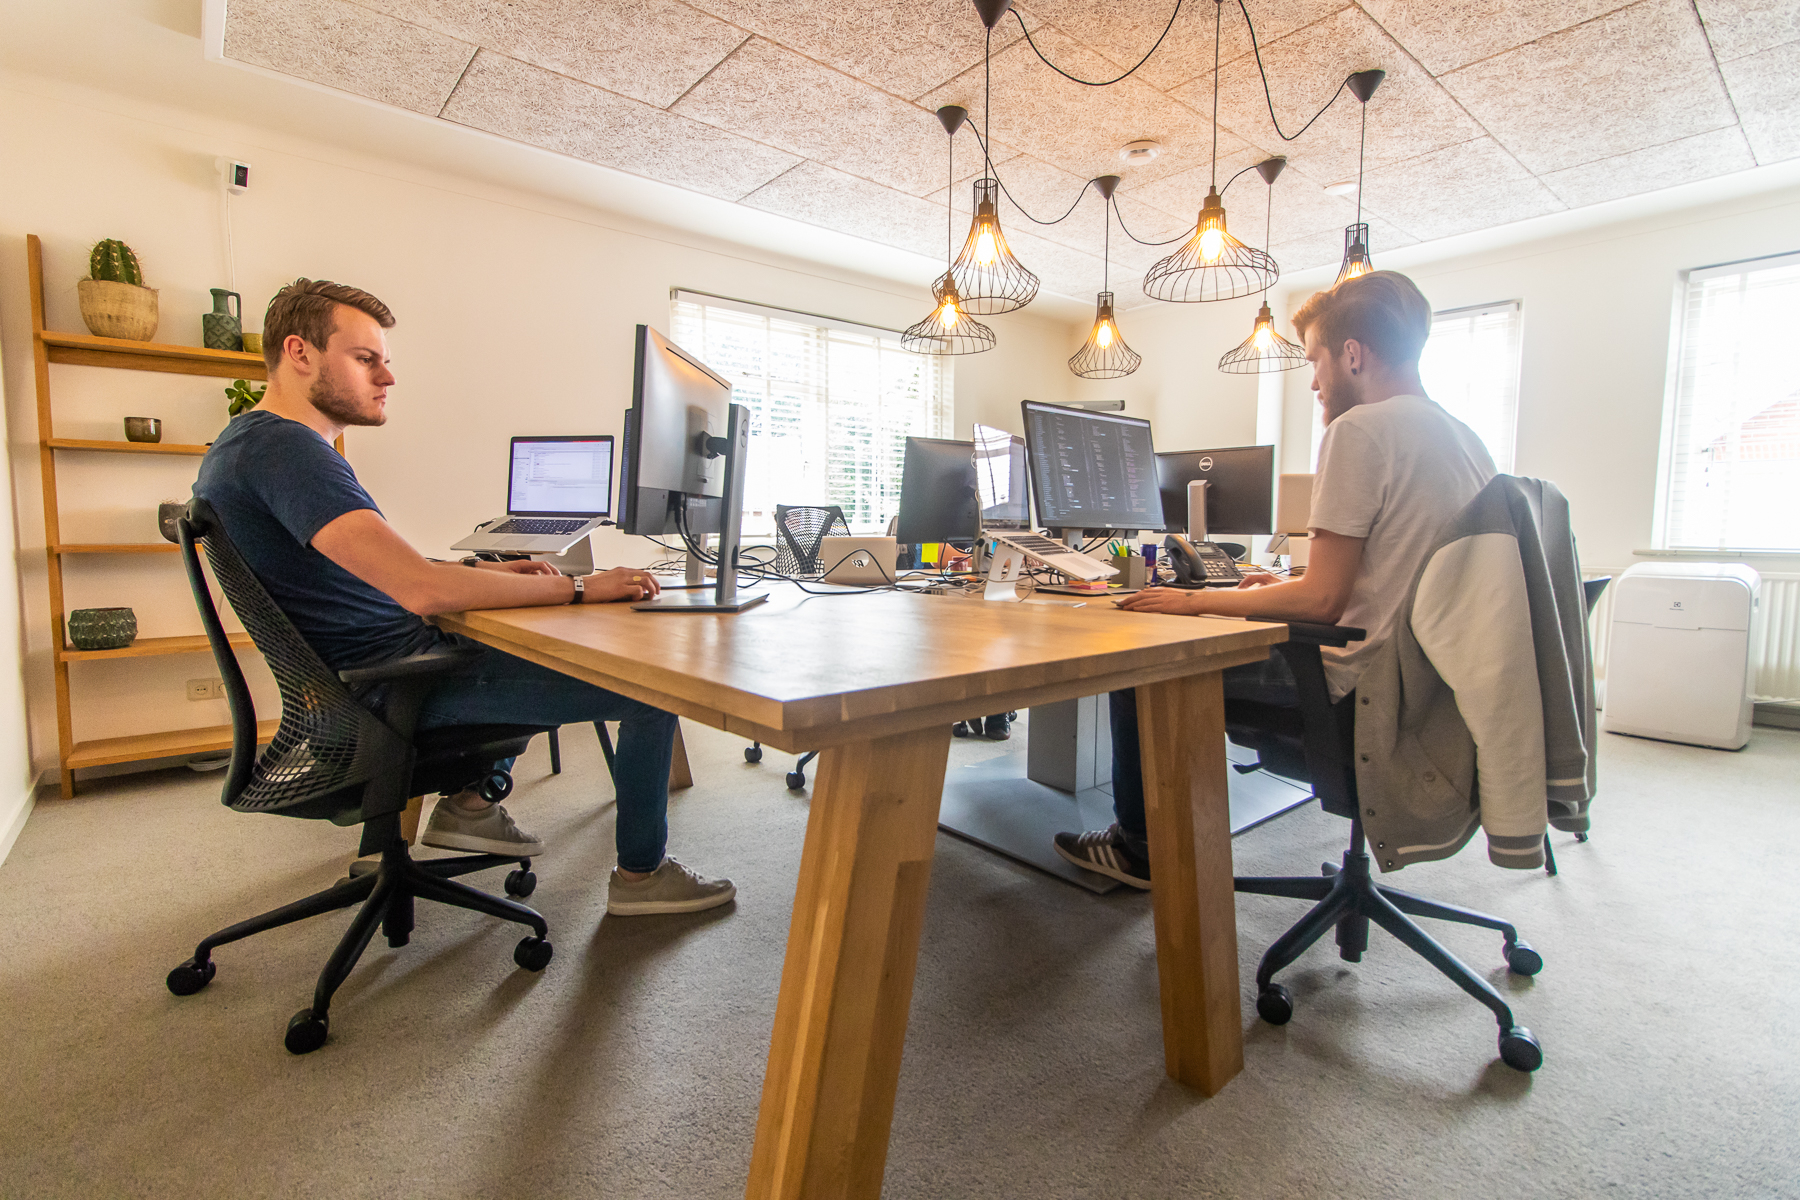 Rent office space Ootmarsumseweg 151, Albergen (16)